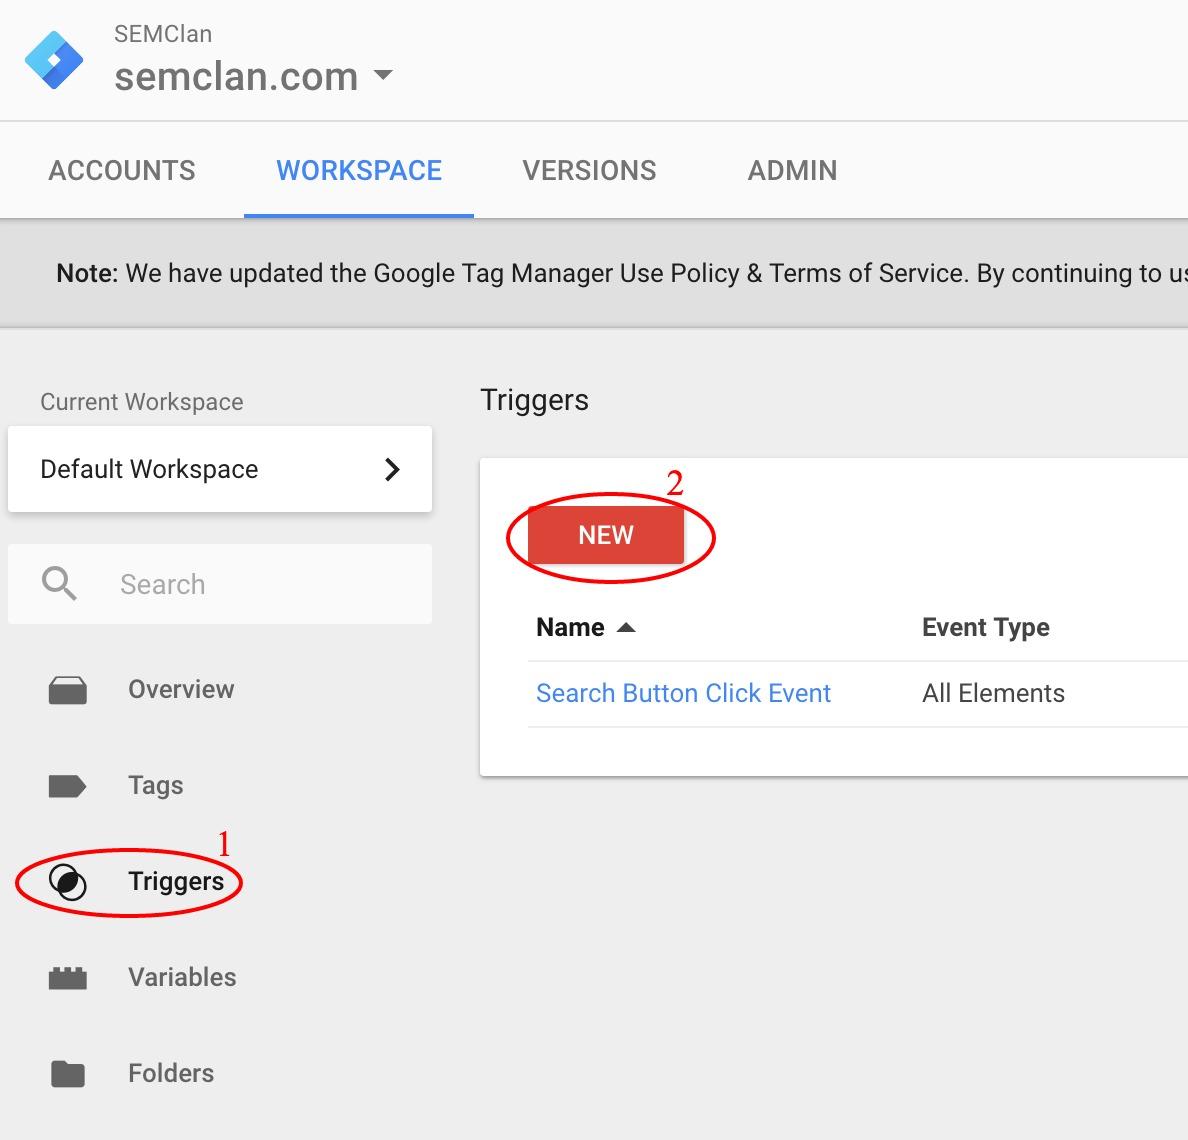 Tạo một trigger mới trong Google Tag Manager